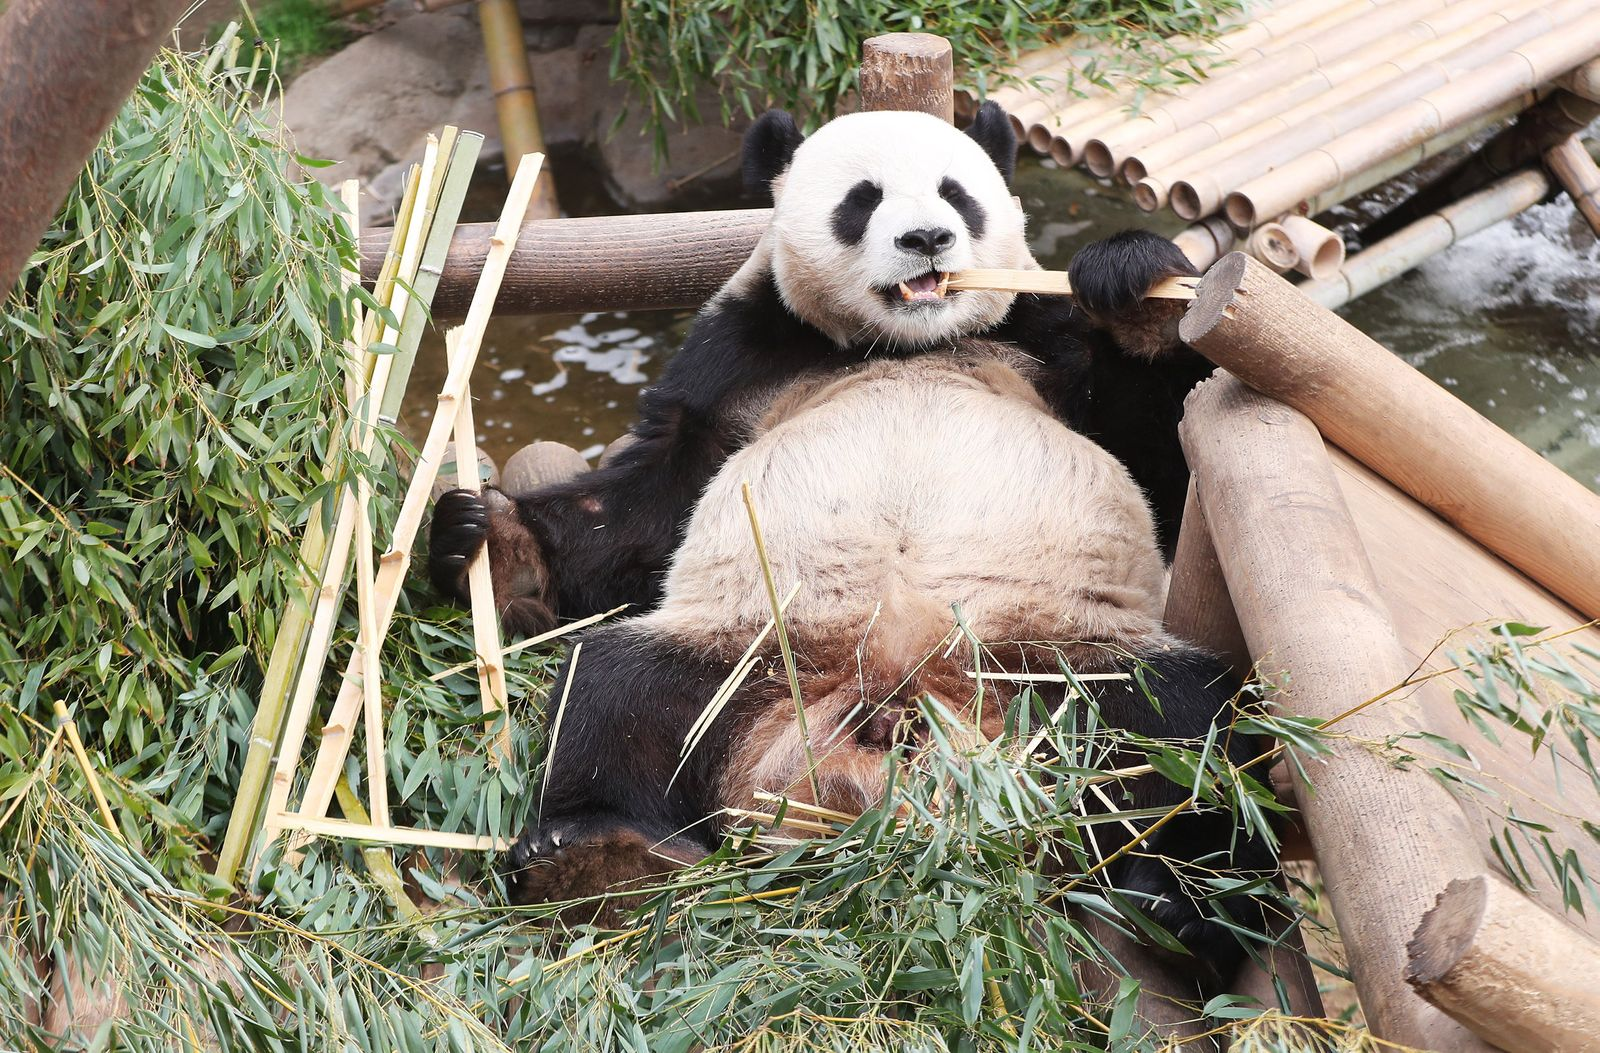 Großer Panda Le Bao